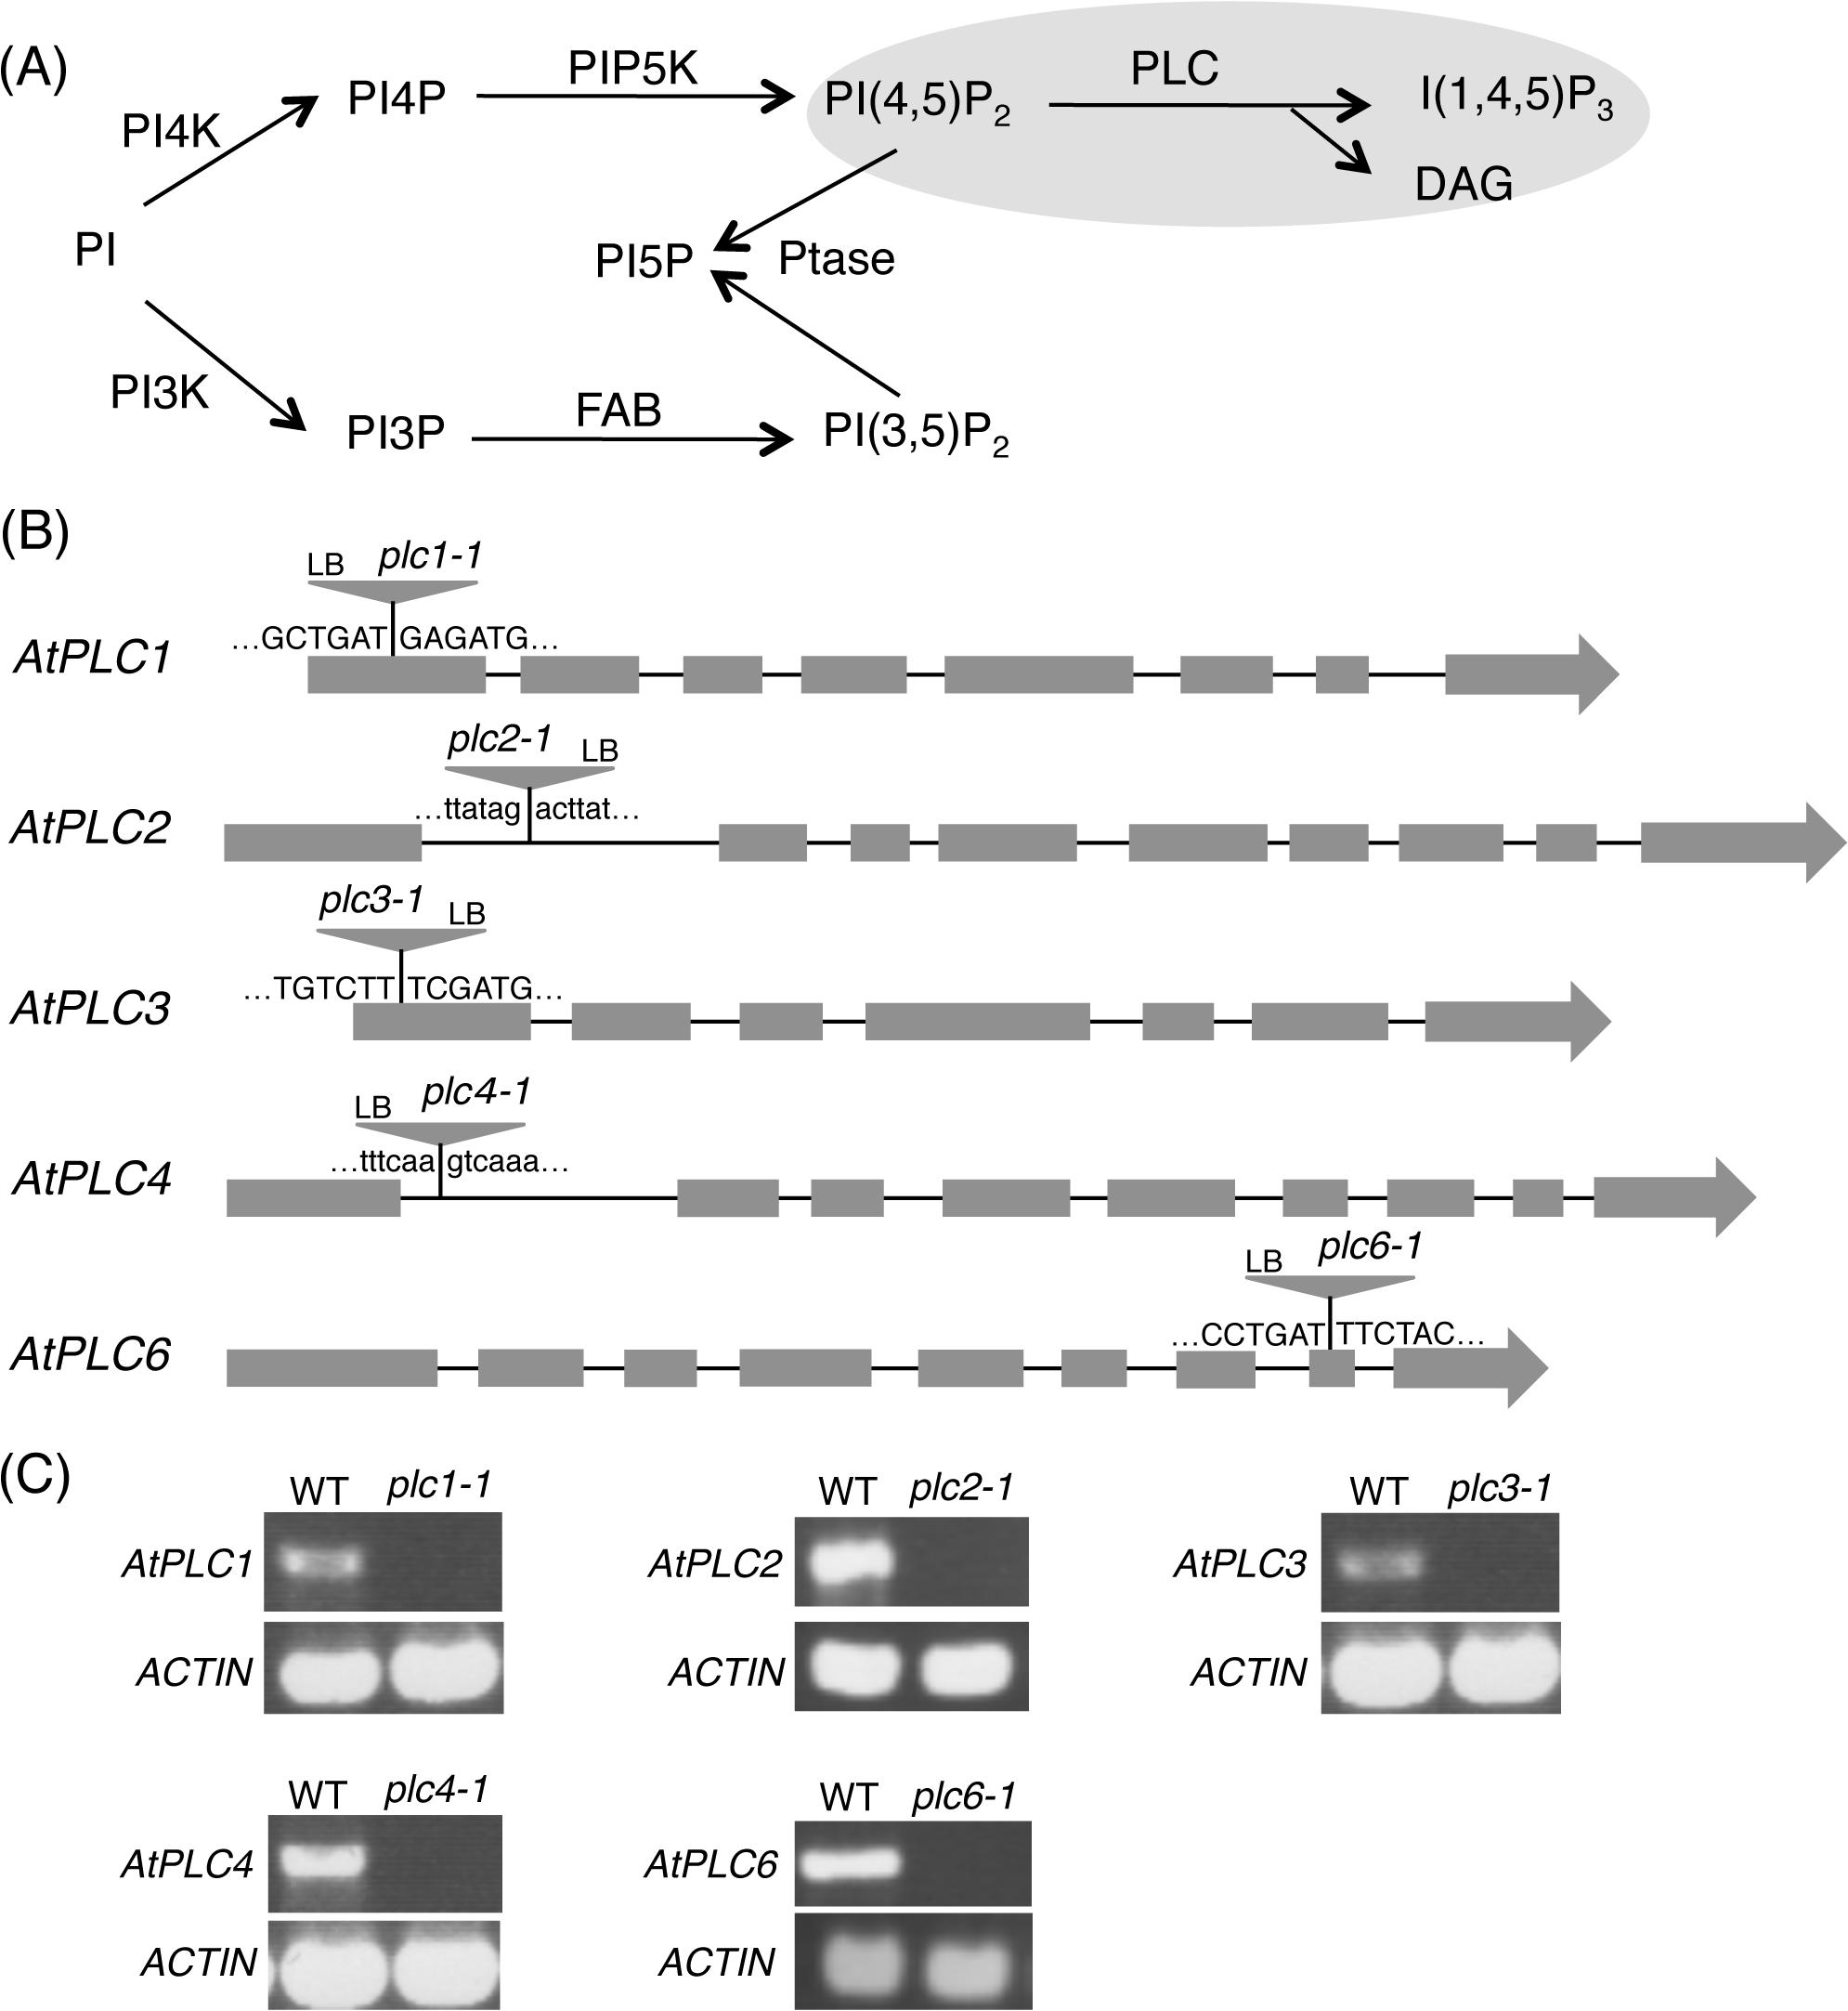 Phosphoinositide-specific phospholipase C (PI-PLC) in phosphoinositide metabolism.